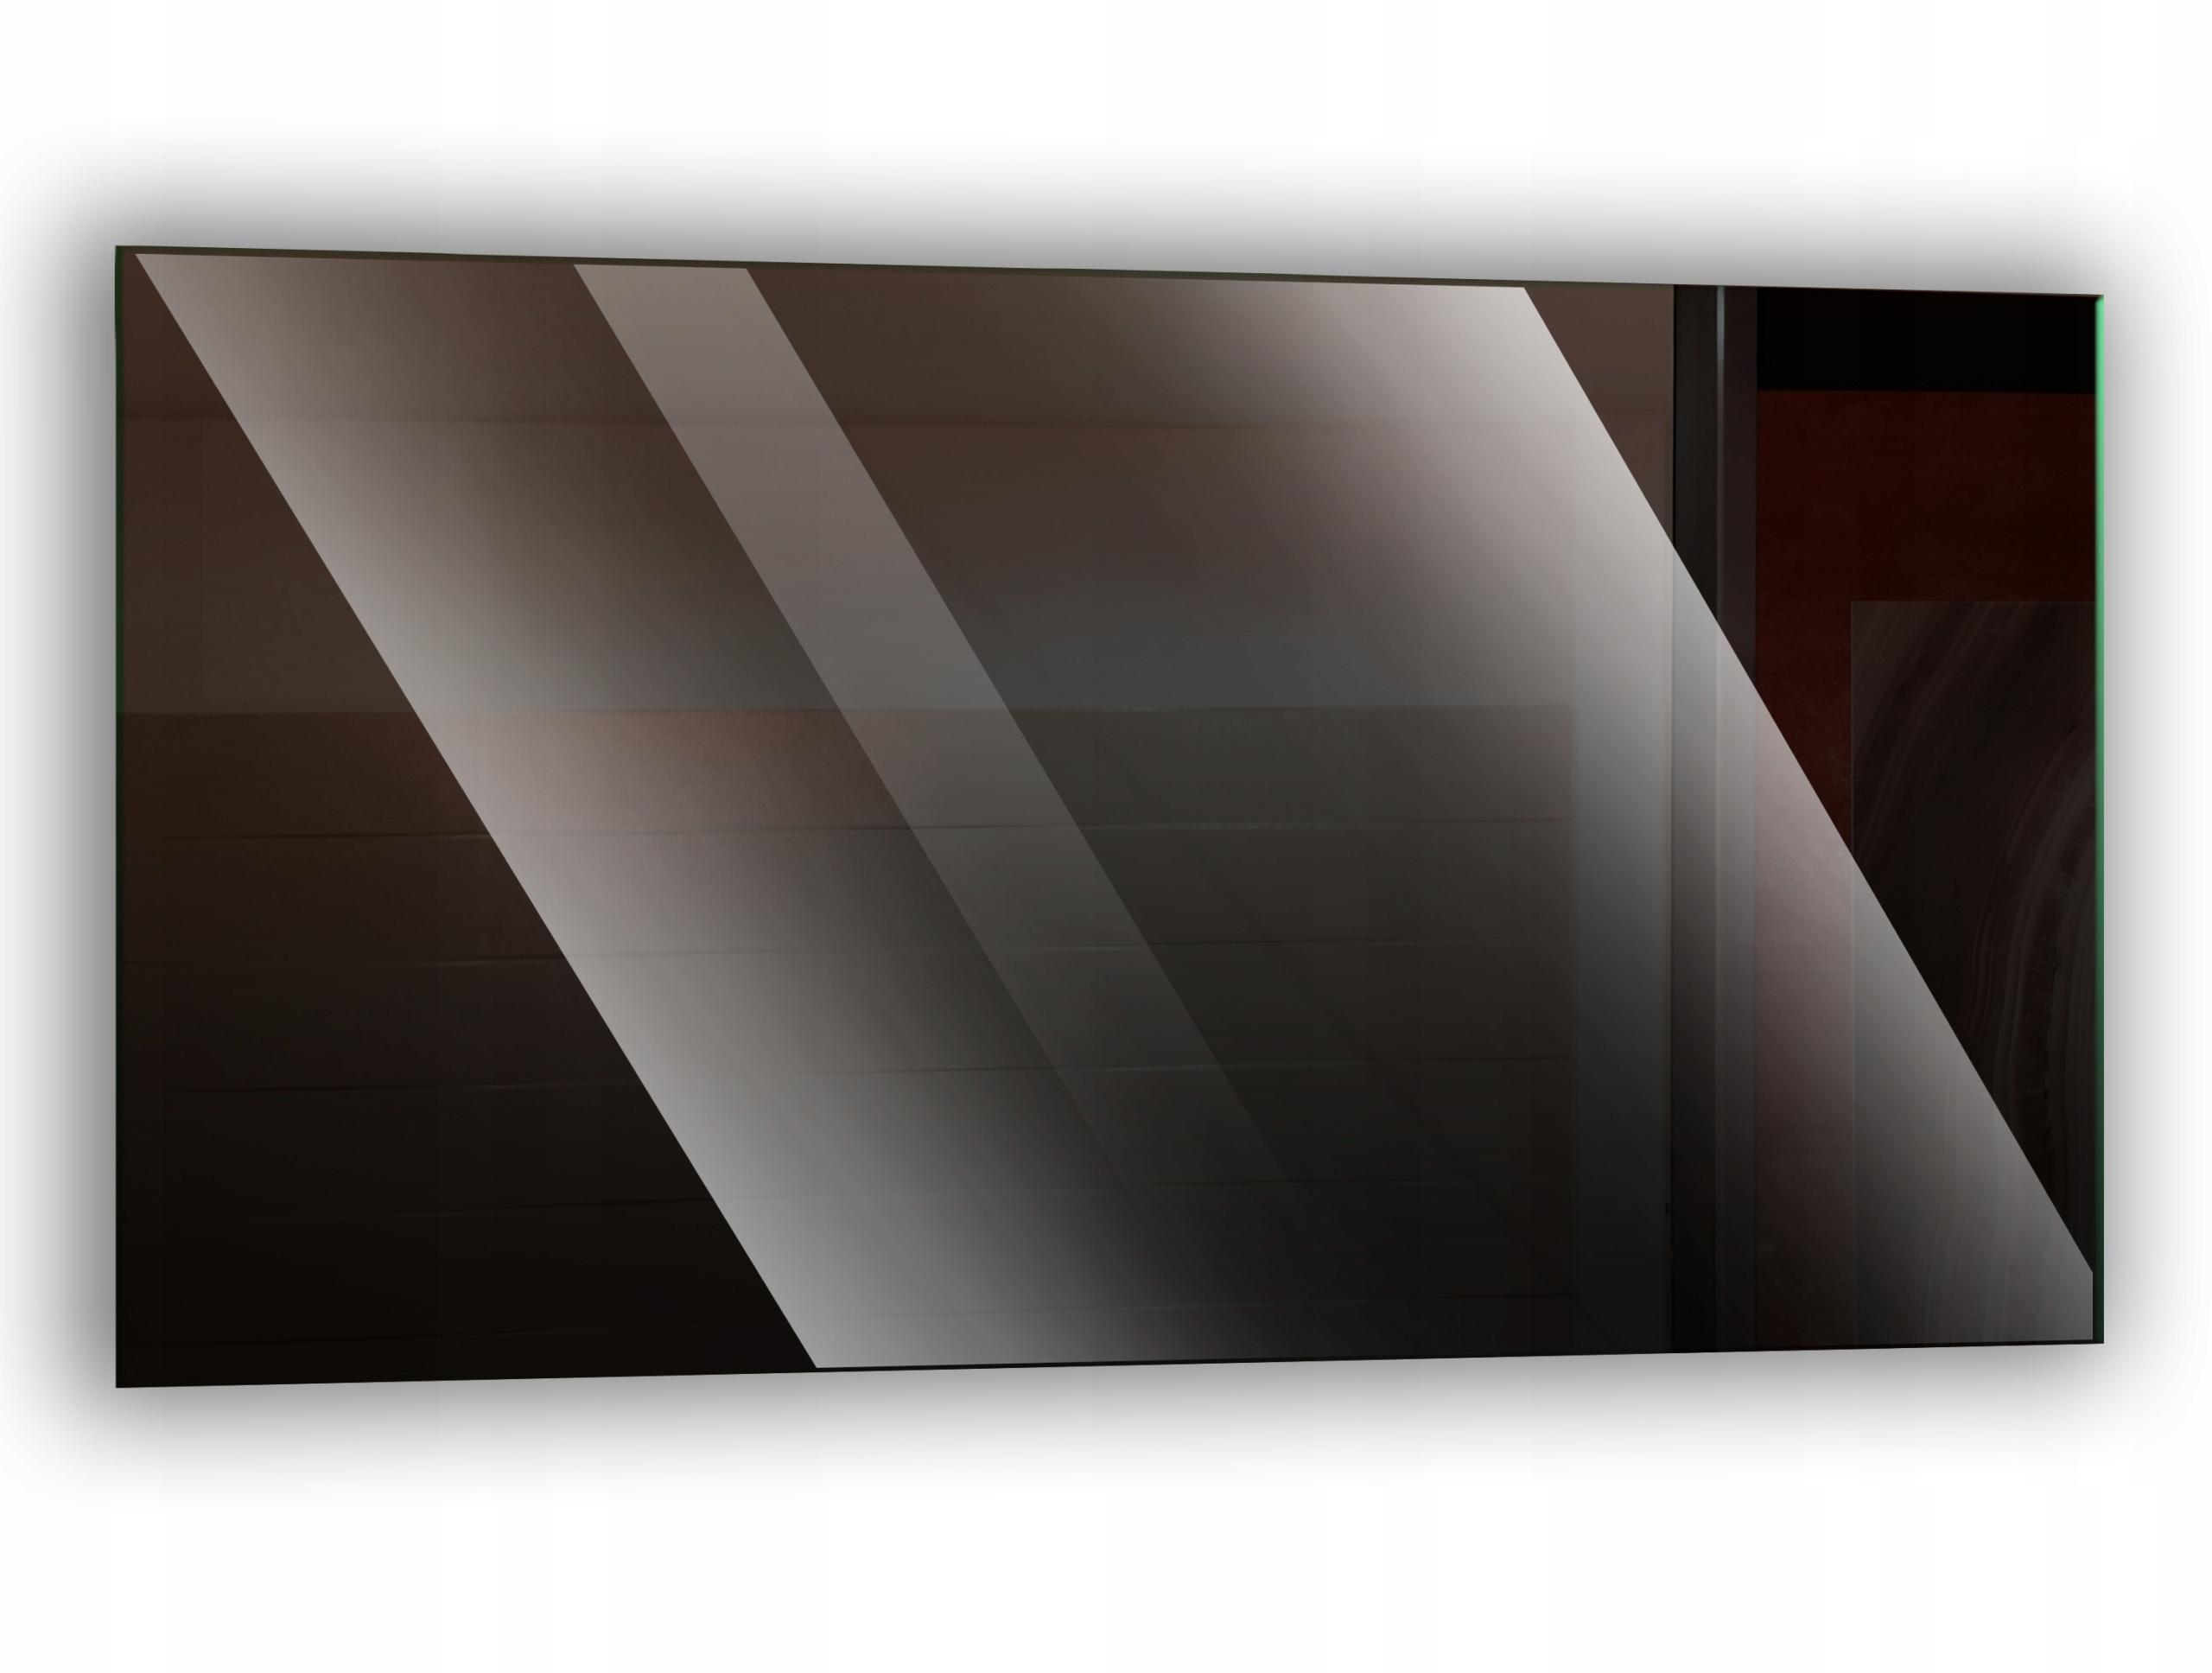 Зеркало для ванной 80x60 LED подсветка